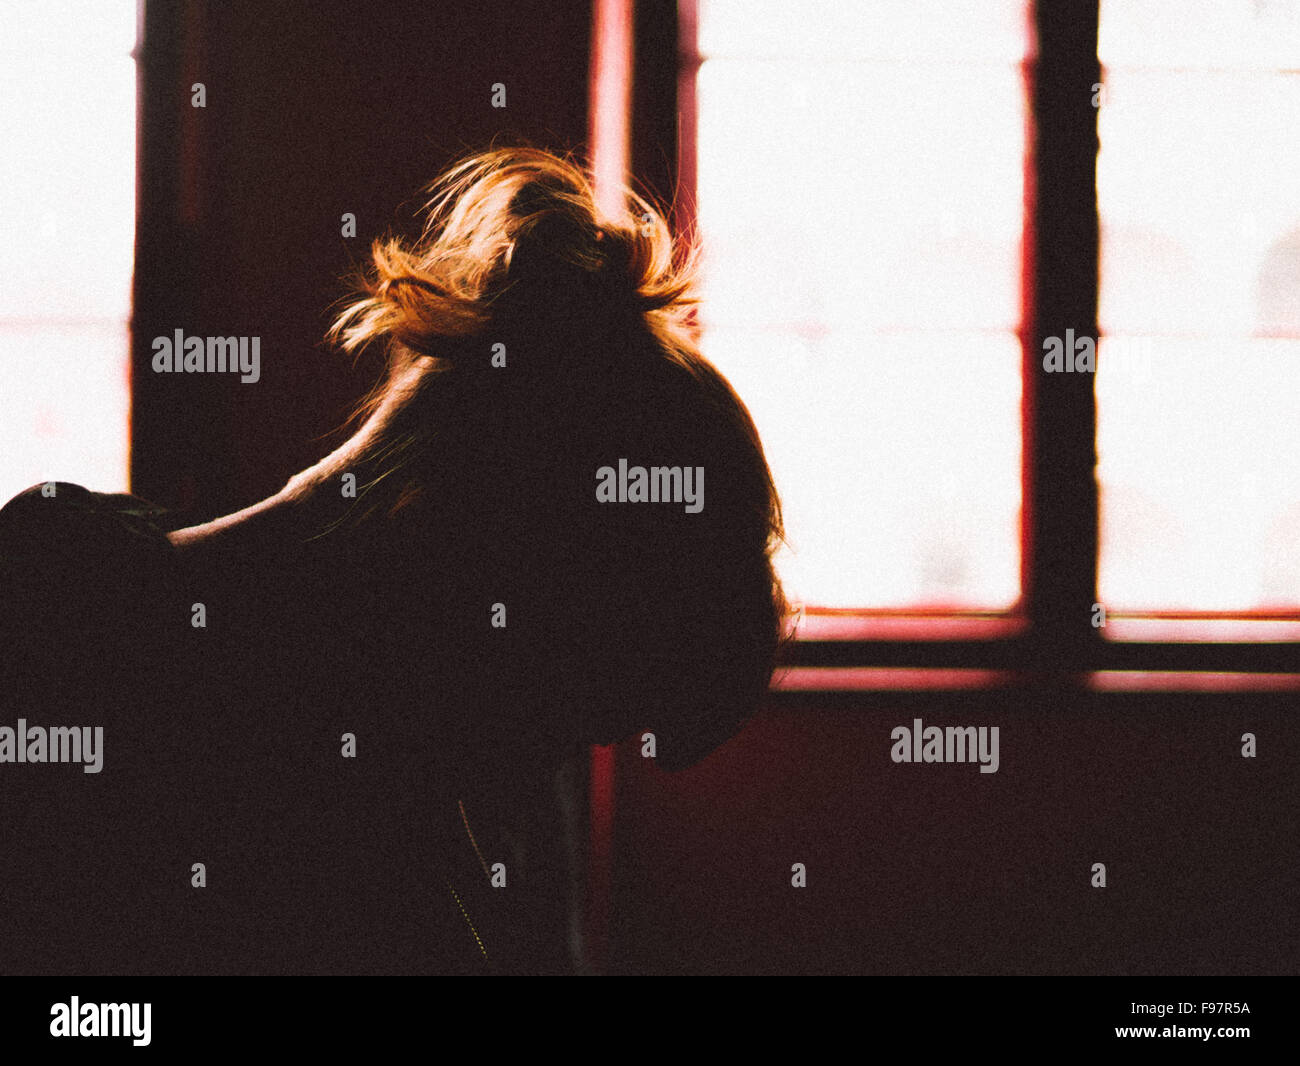 Silueta de mujer deprimida Imagen De Stock